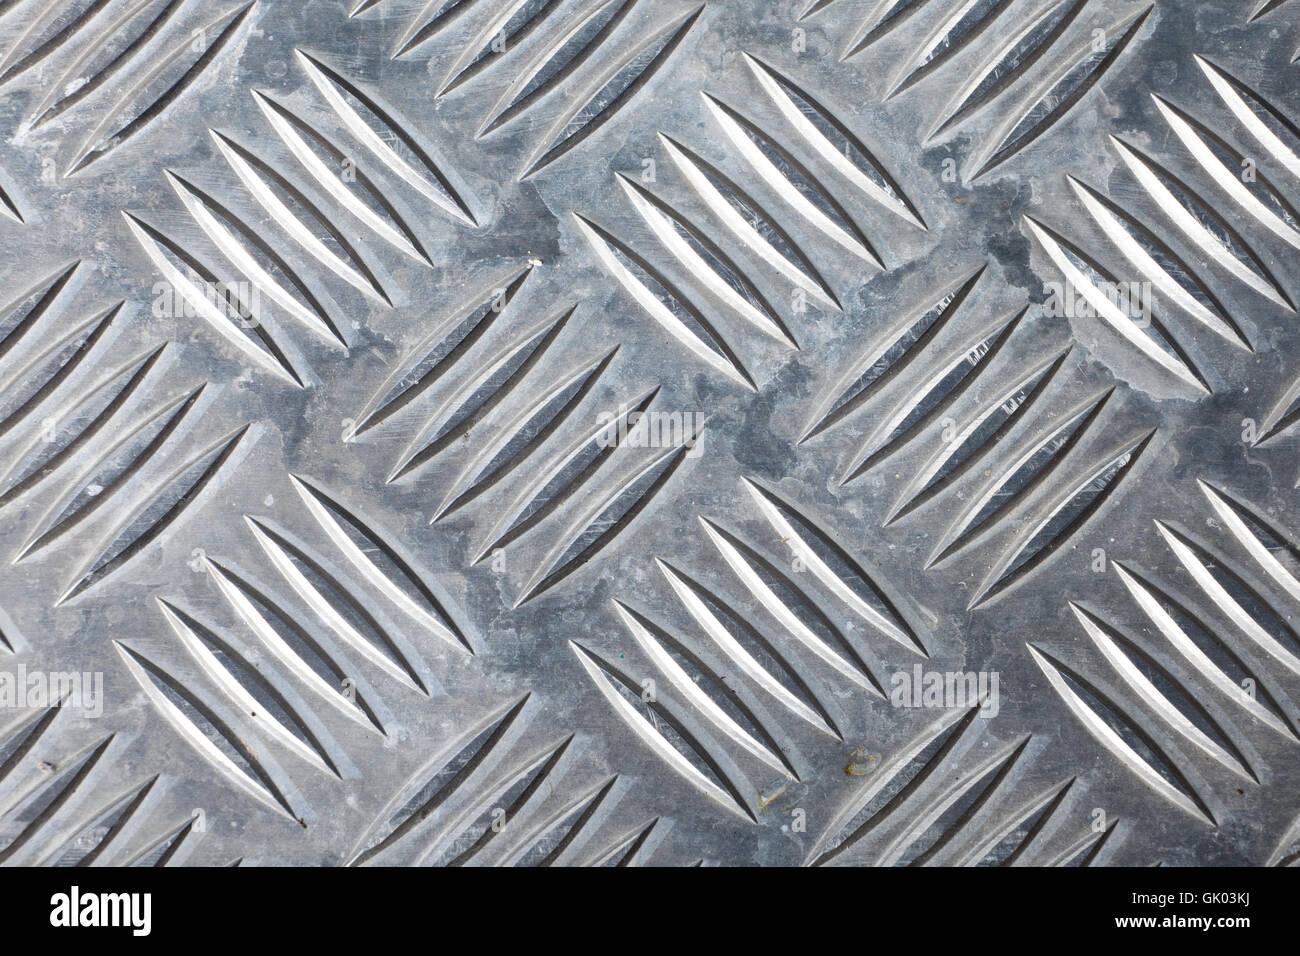 dirty corrugated sheet metal background - Stock Image